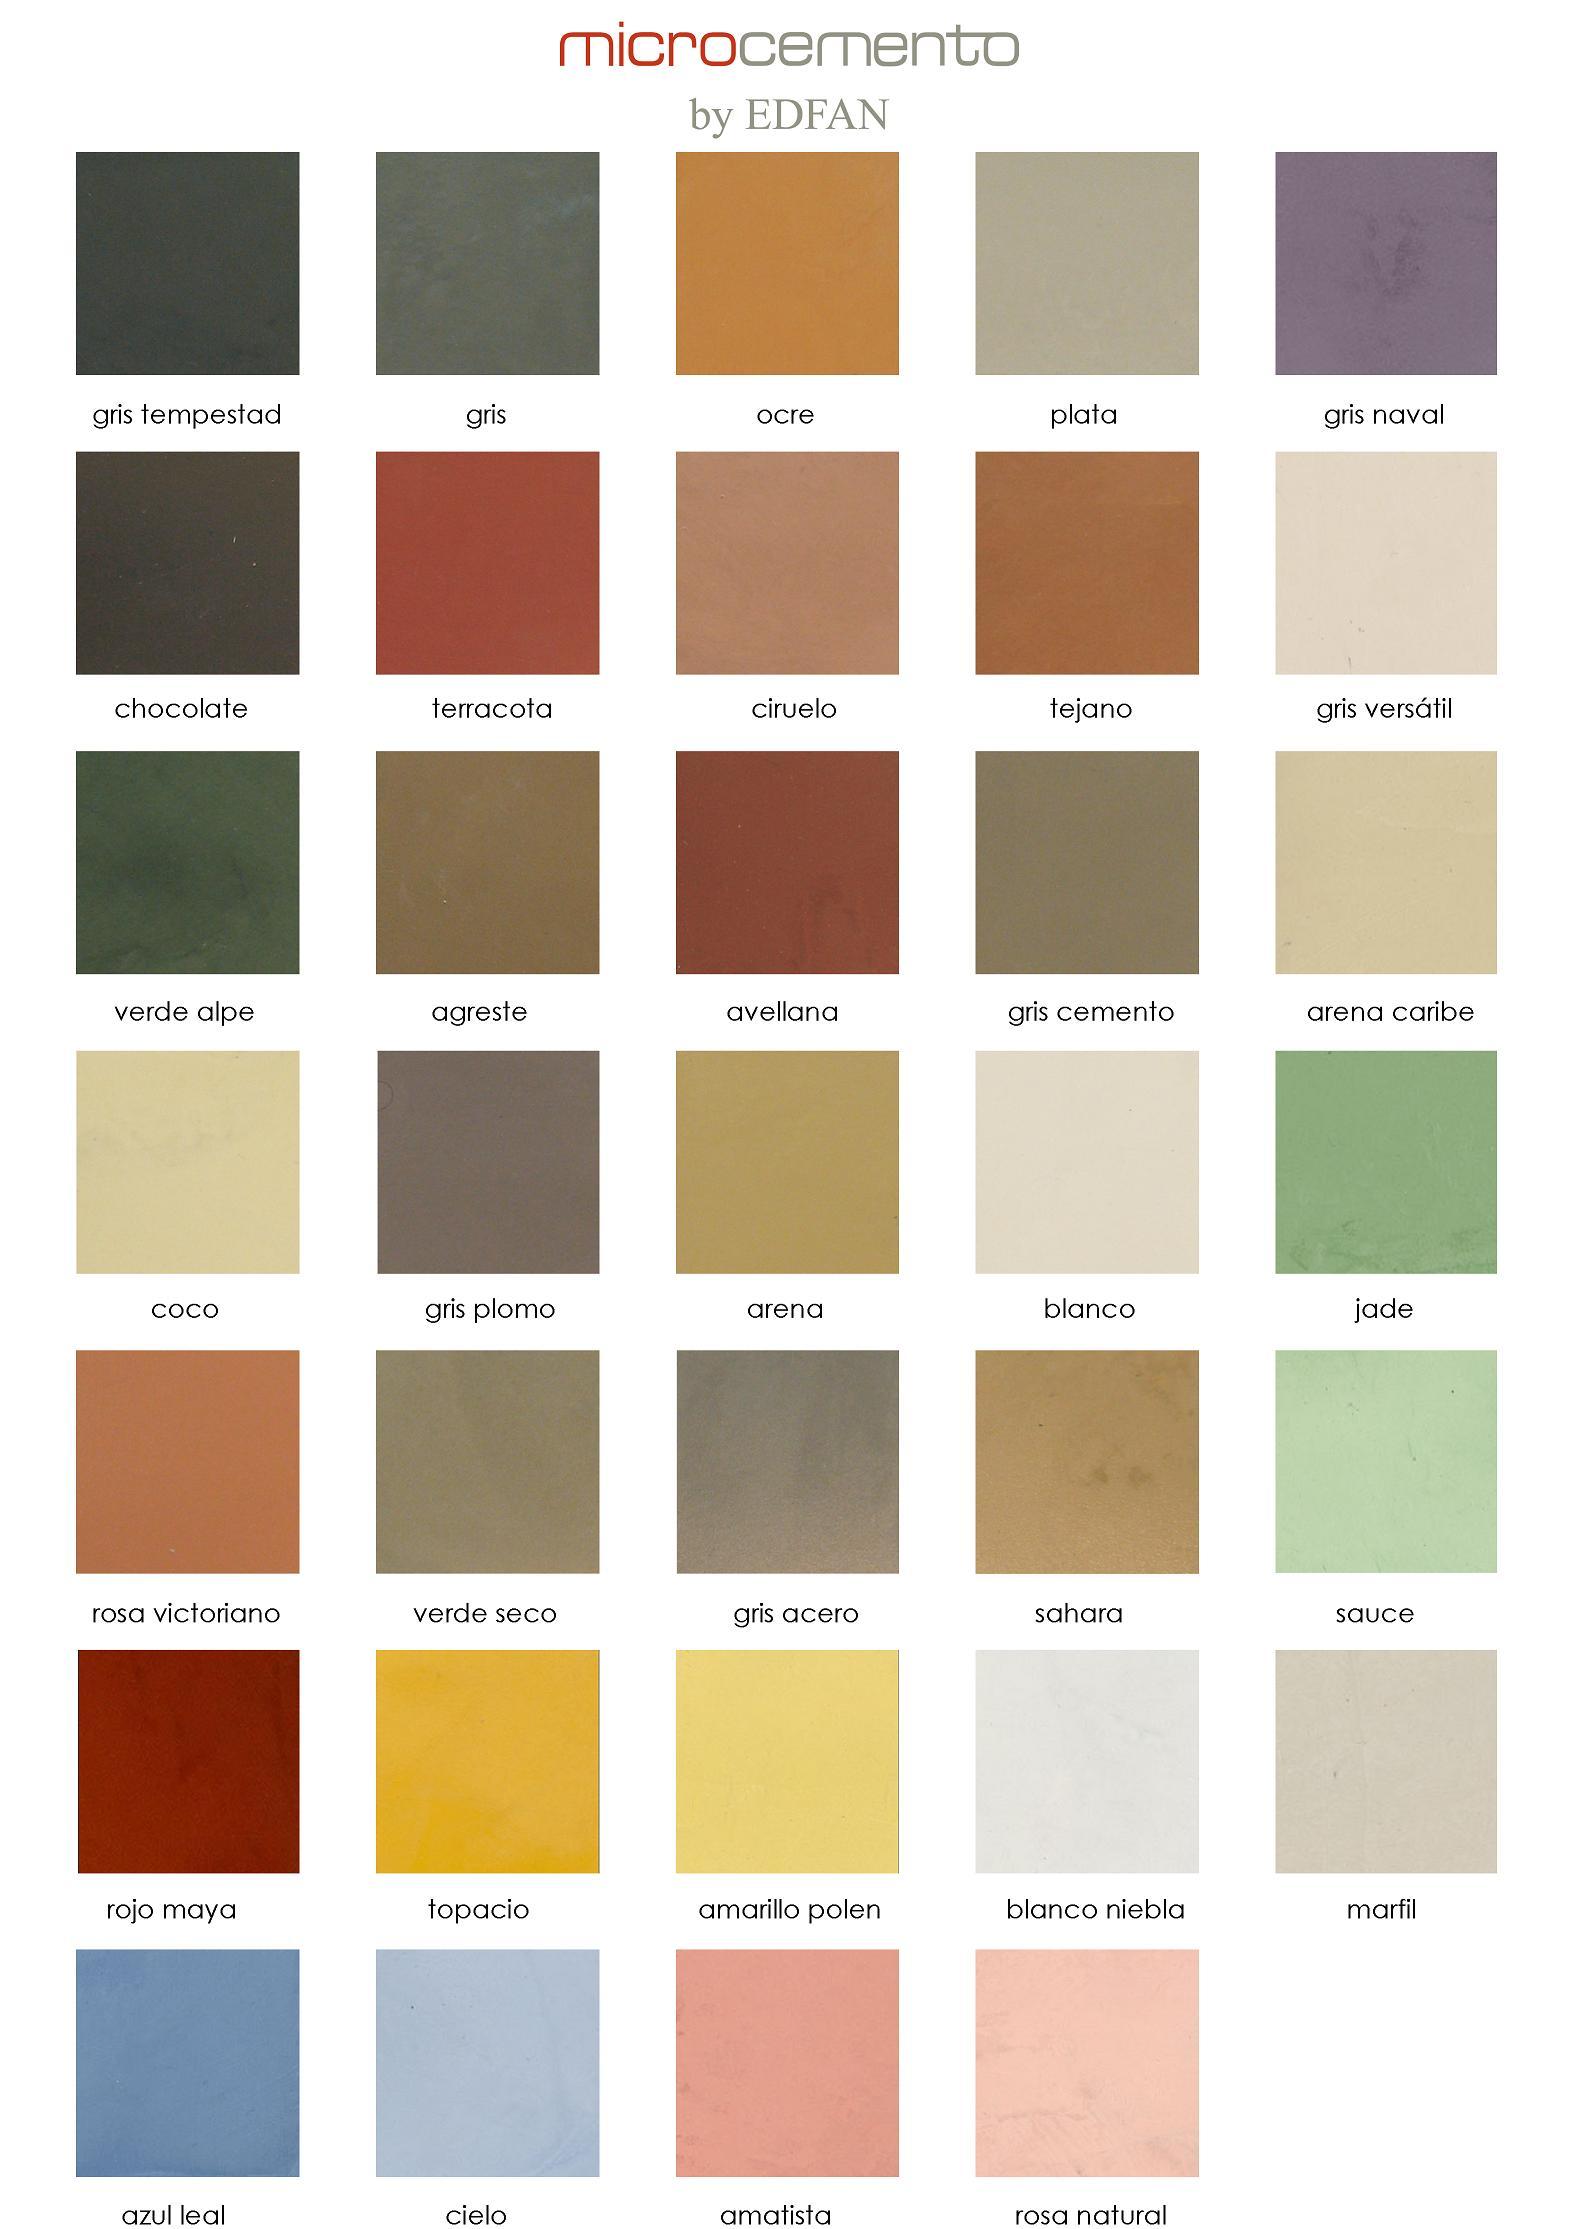 Carta de colores marfil sevilla - Aplicacion de microcemento en paredes ...